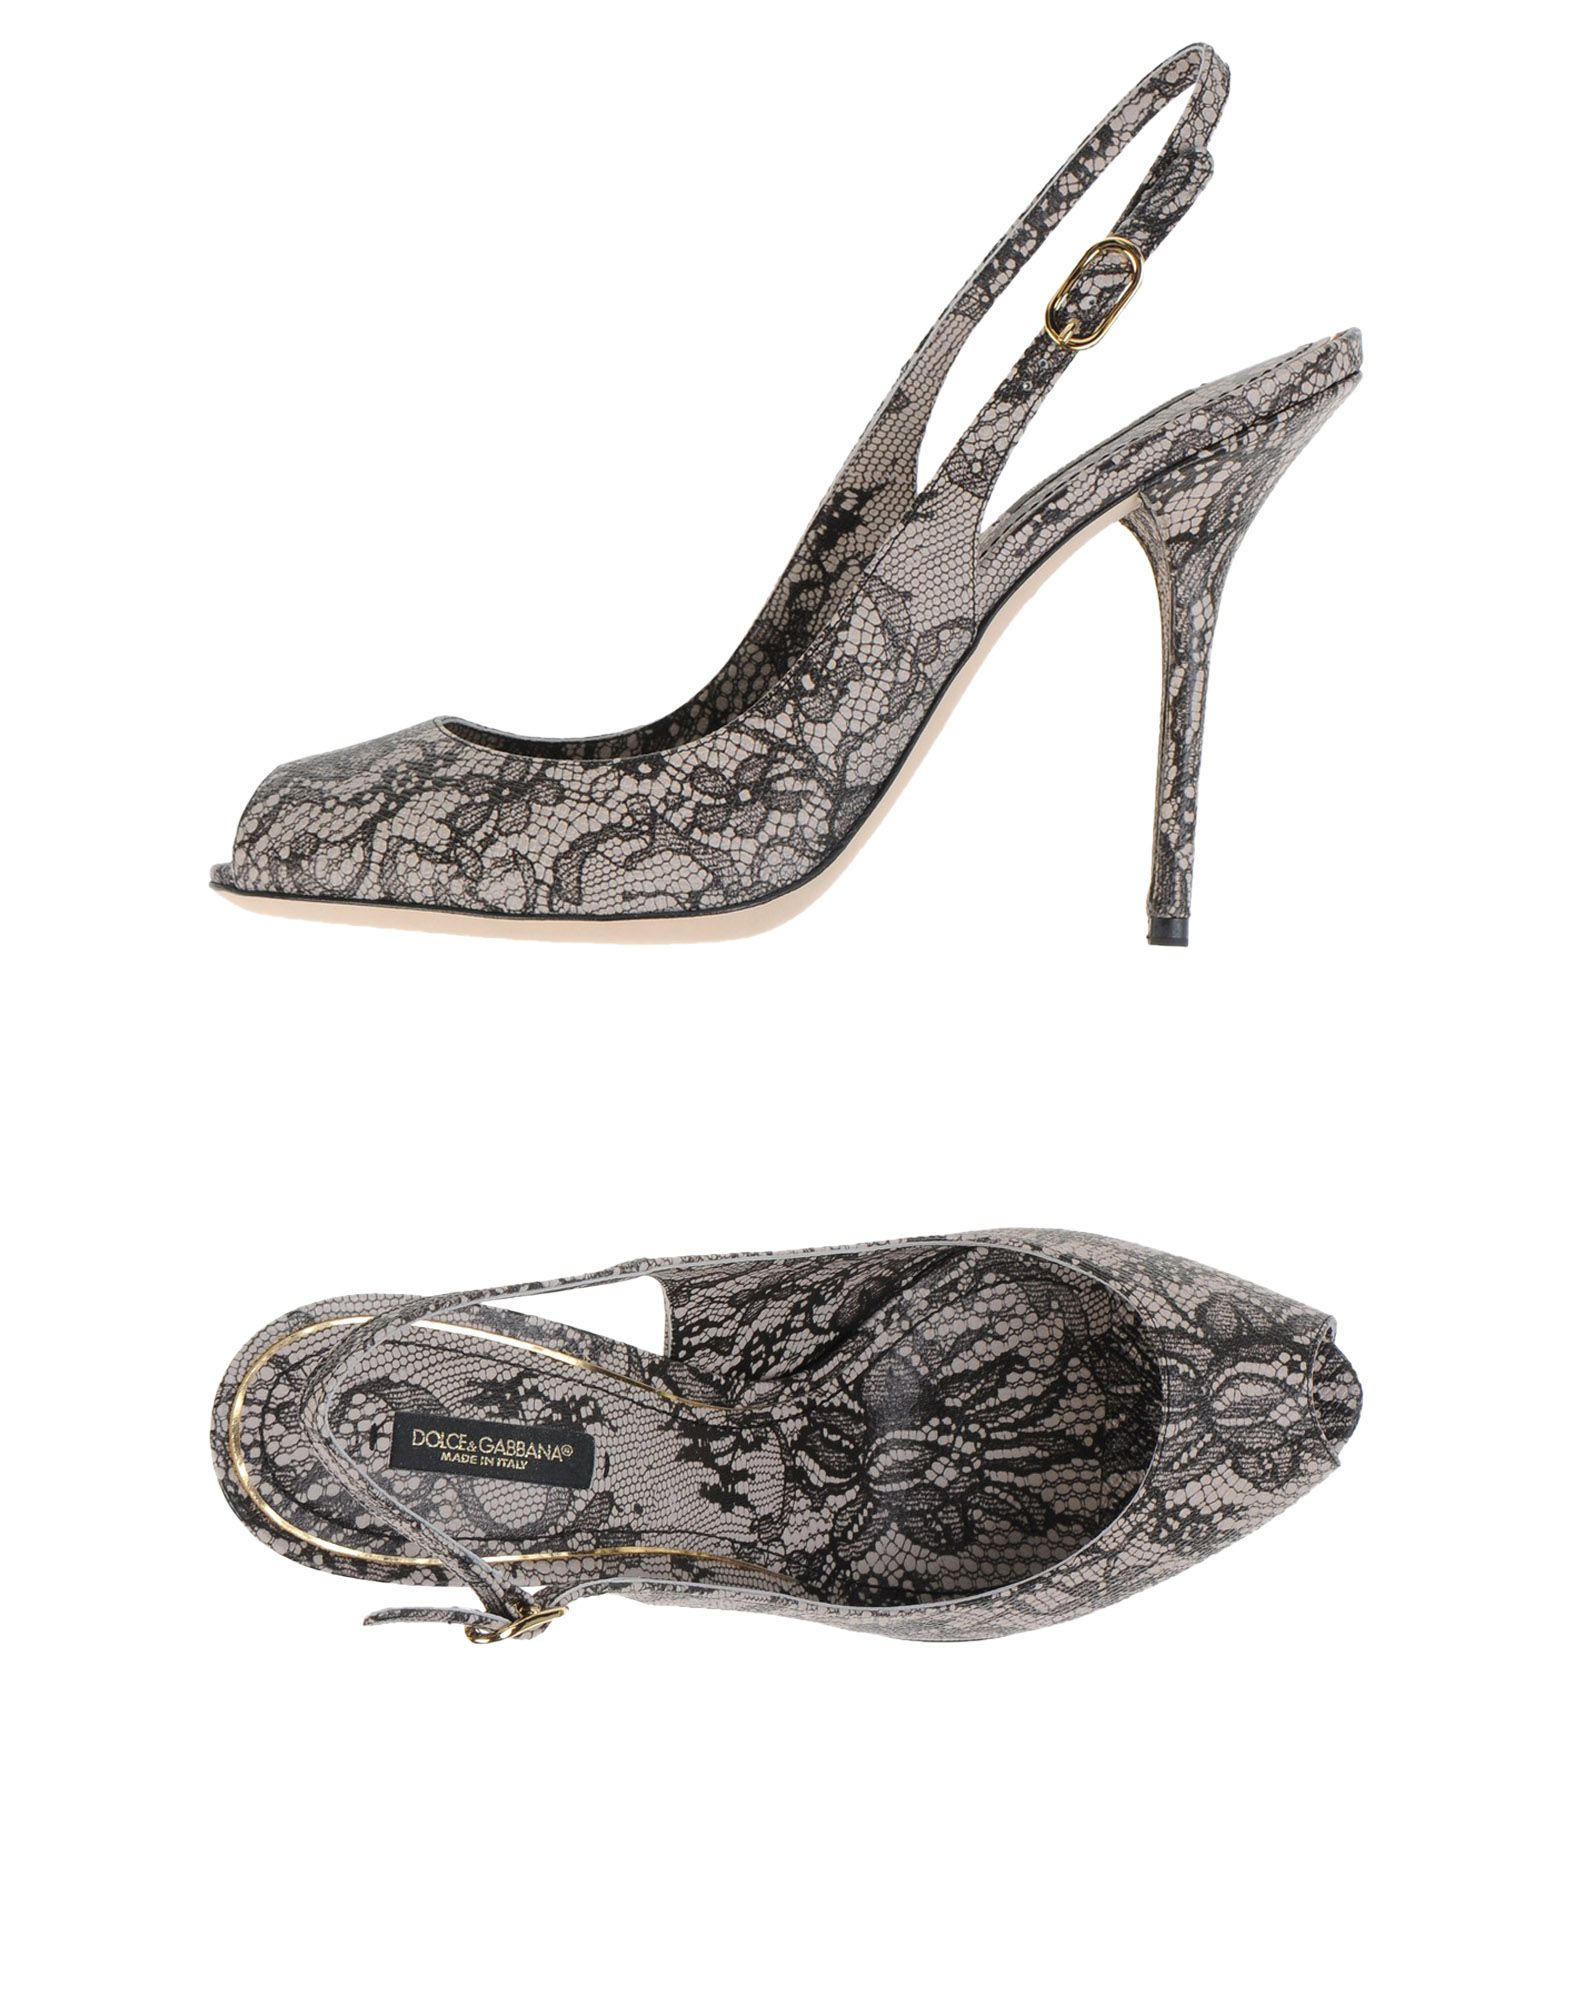 dolce & amp; gabbana sandales sandales sandales - femmes dolce & amp; gabbana sandales en ligne au royaume - uni - 44883771gn 1391e5